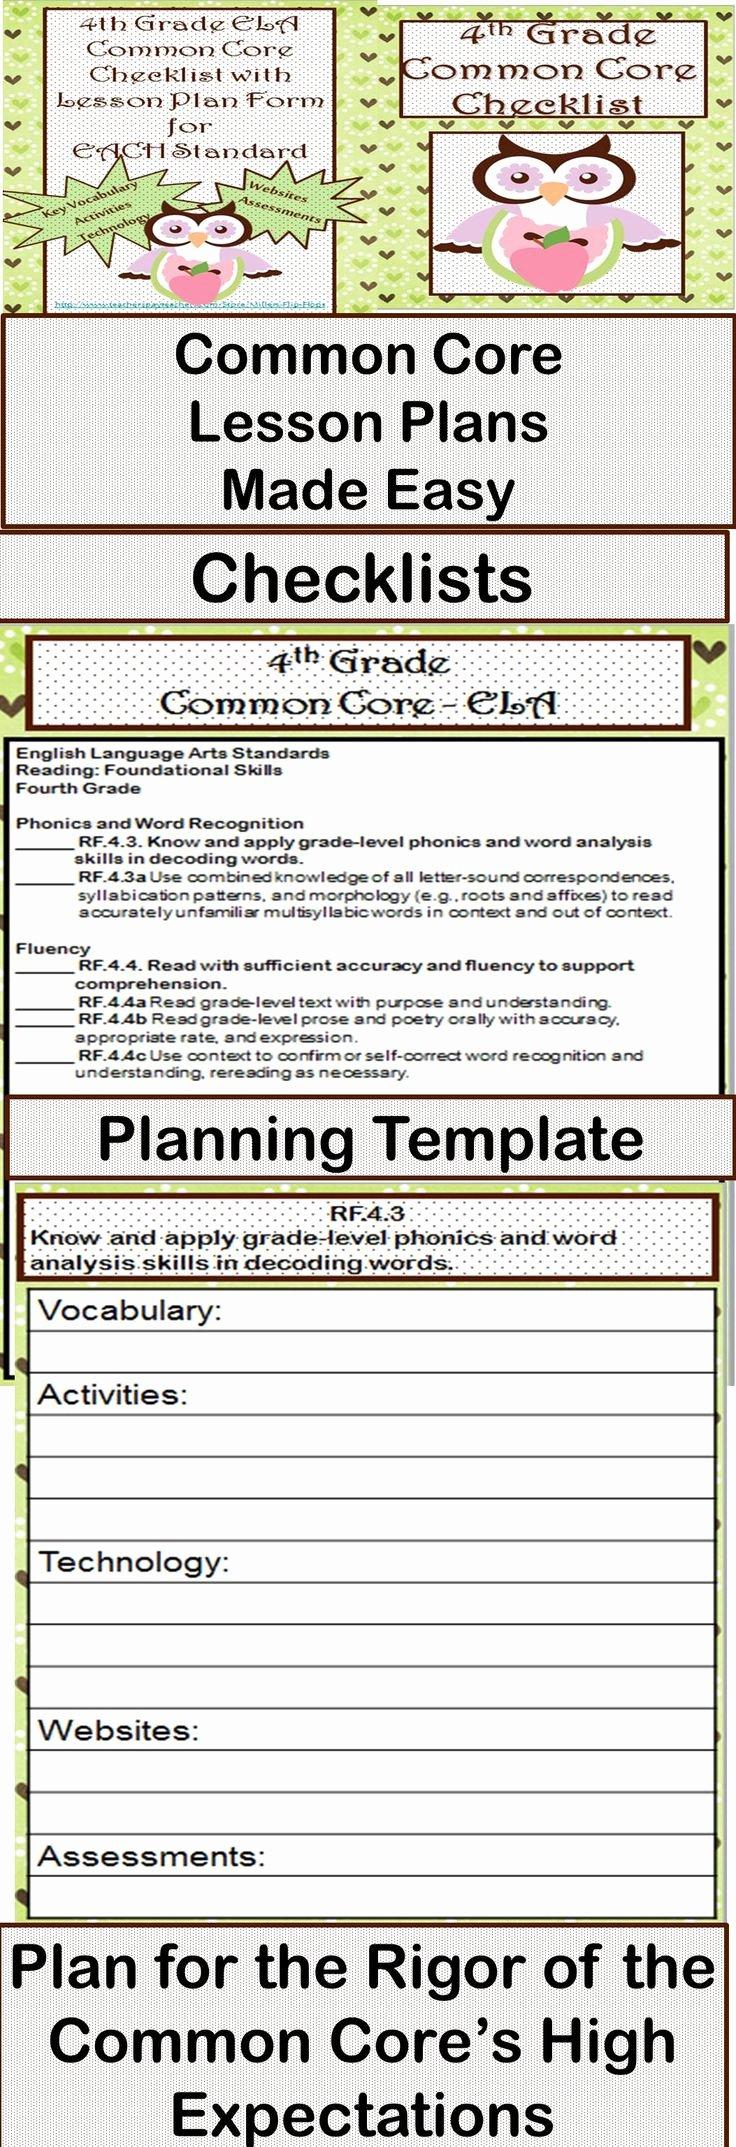 Lesson Plan Template Common Core Beautiful 53 Best Images About Lesson Plans On Pinterest